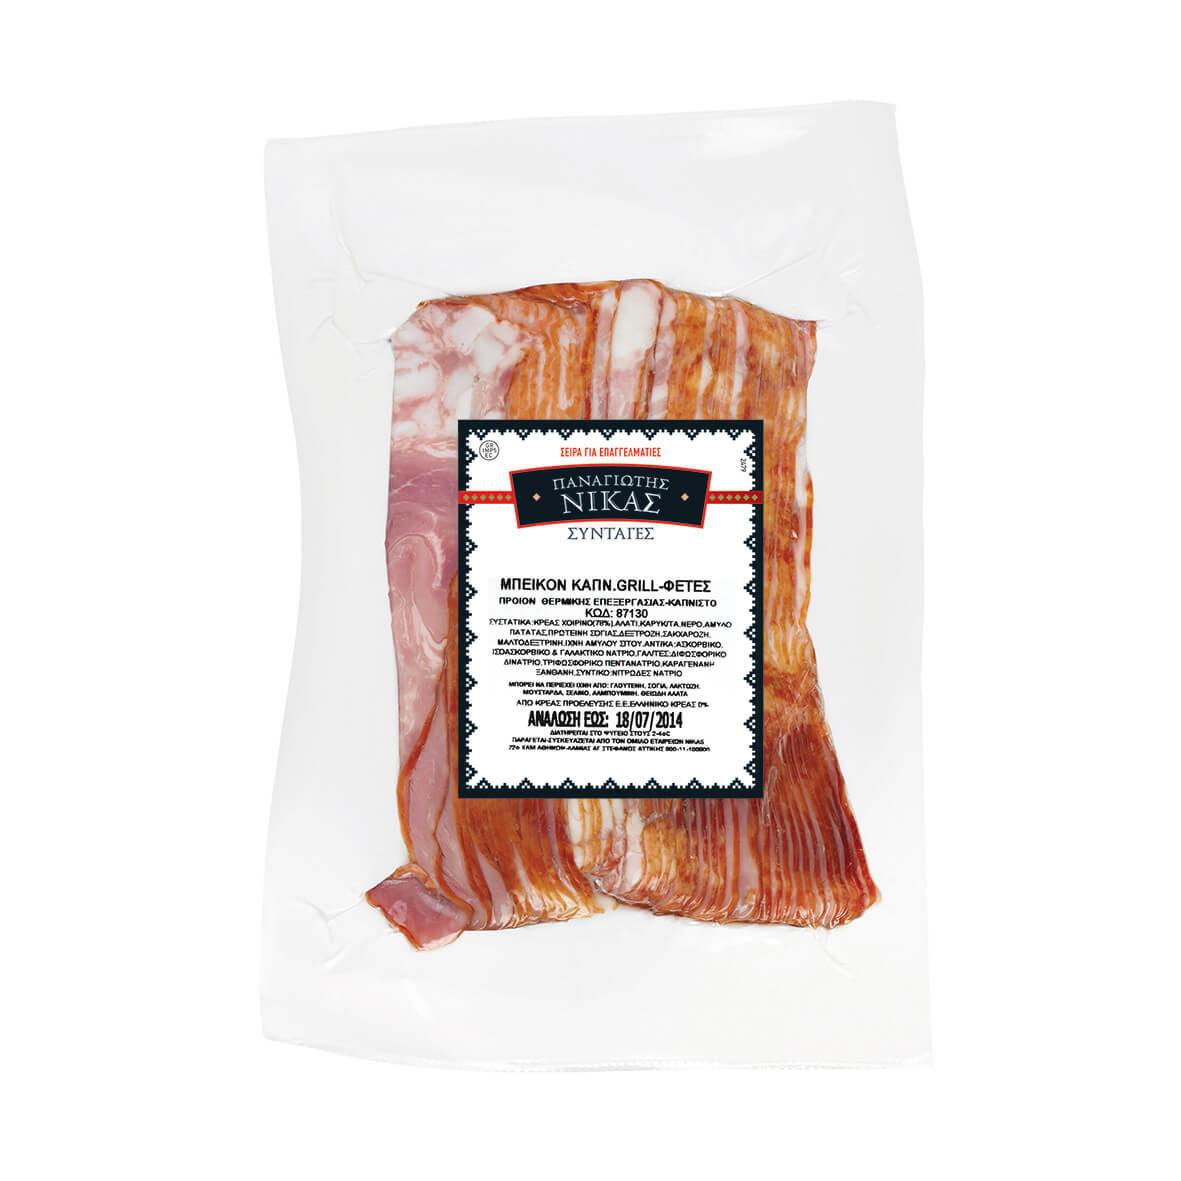 NIKAS bacon grill kapnisto fetes